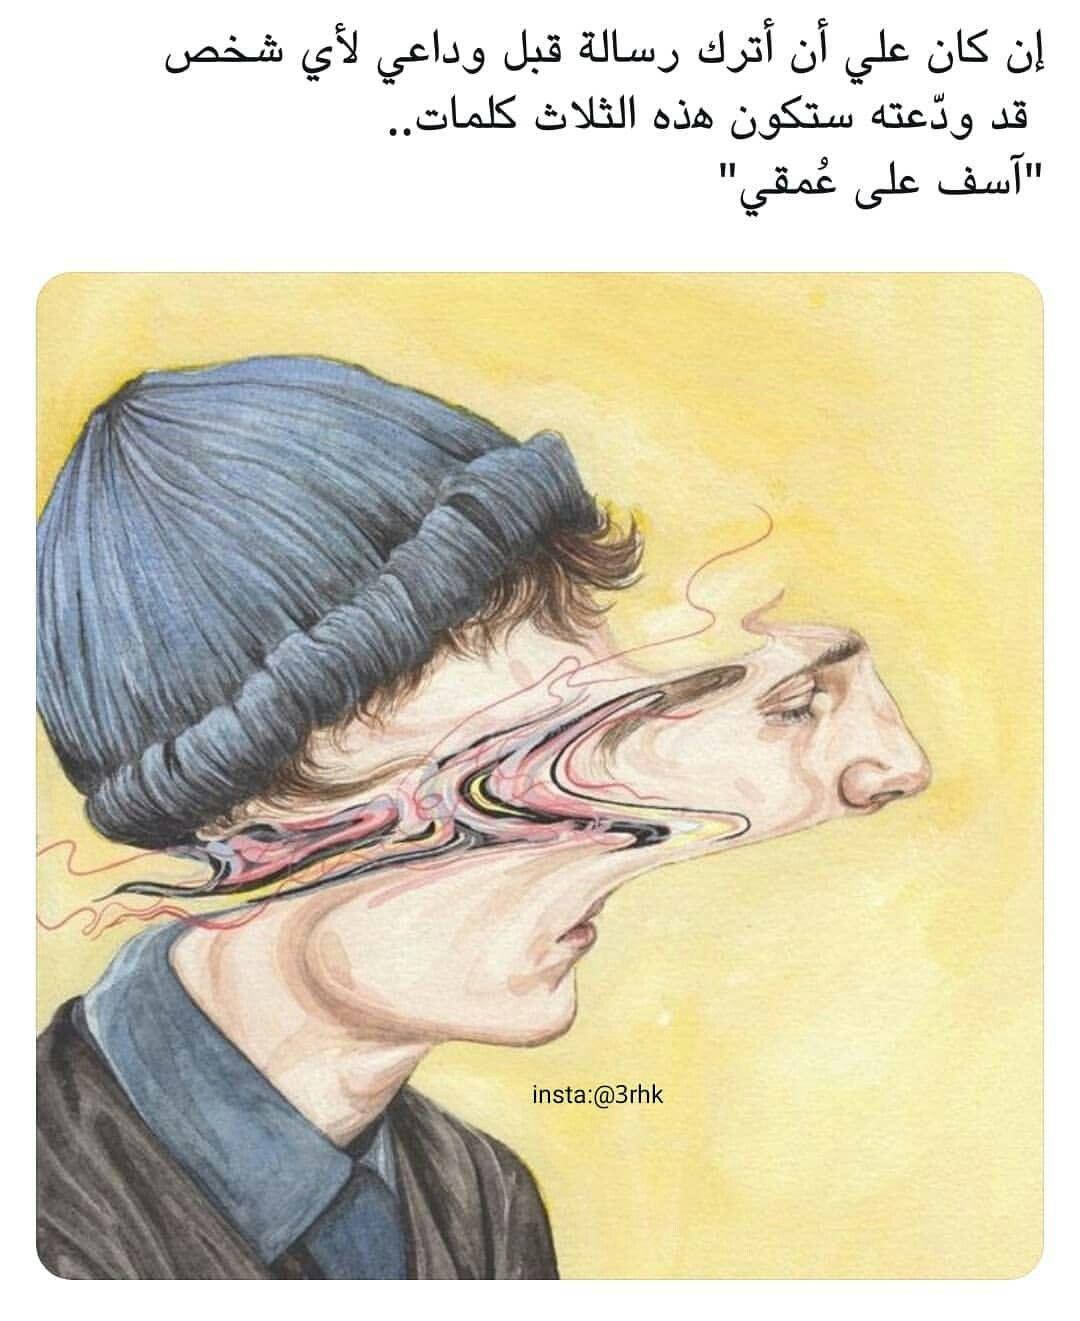 آسف جدا Arabic Funny Cool Words Arabic Quotes